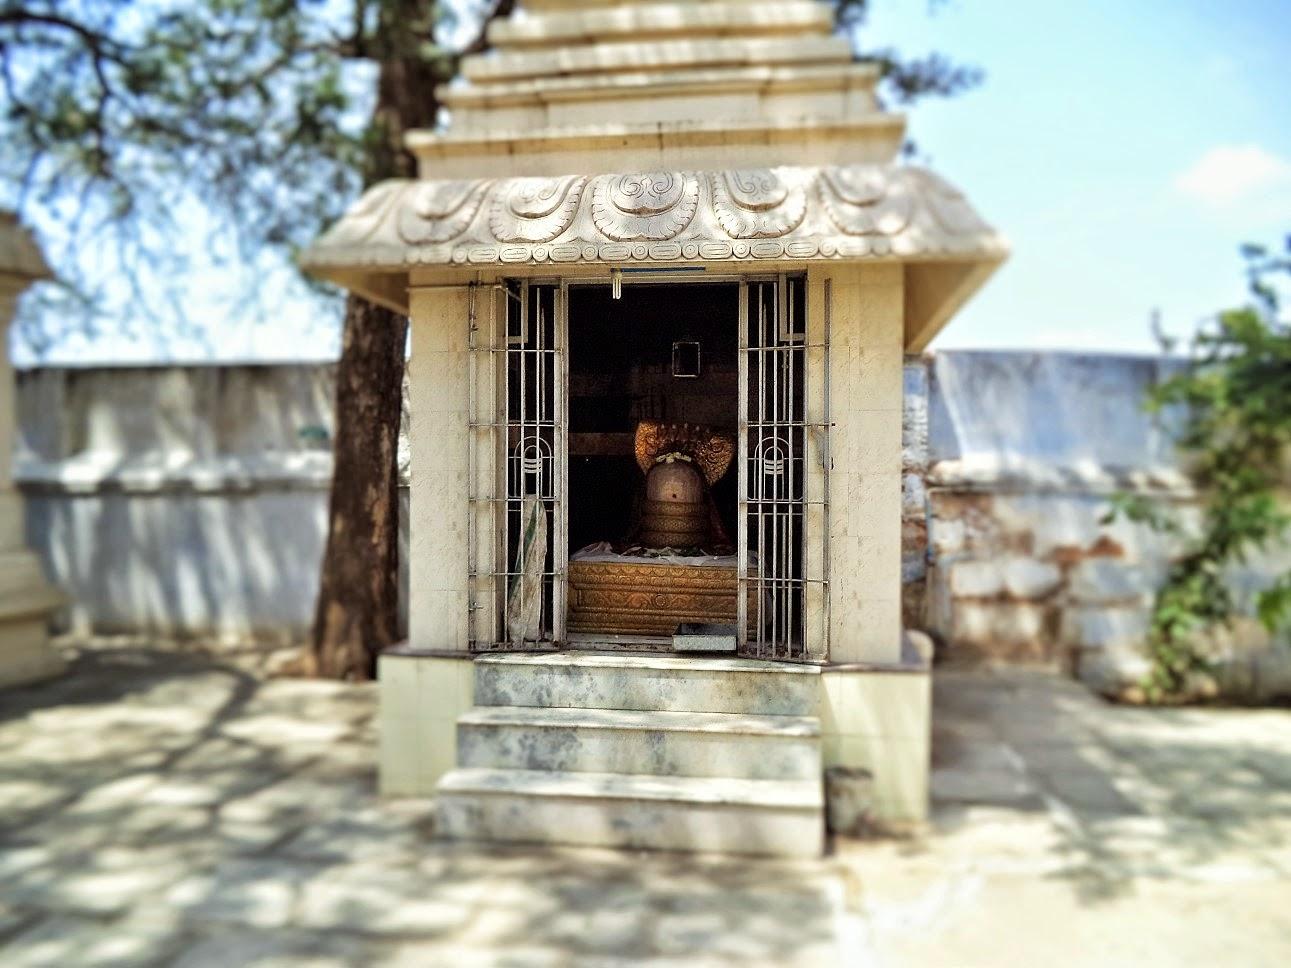 Theneeswarar Temple Vellalore Coimbatore, Vellalore; Coimbatore; India; Hindu; God; Hindu God; Temple; Theneeswarar Temple; Shiv; Shiva; Lord Shiva; Siva perumaan; eeshwar; Shiv Lingam in Theneeswarar temple, Vellalore, South India, Tamil Nadu,